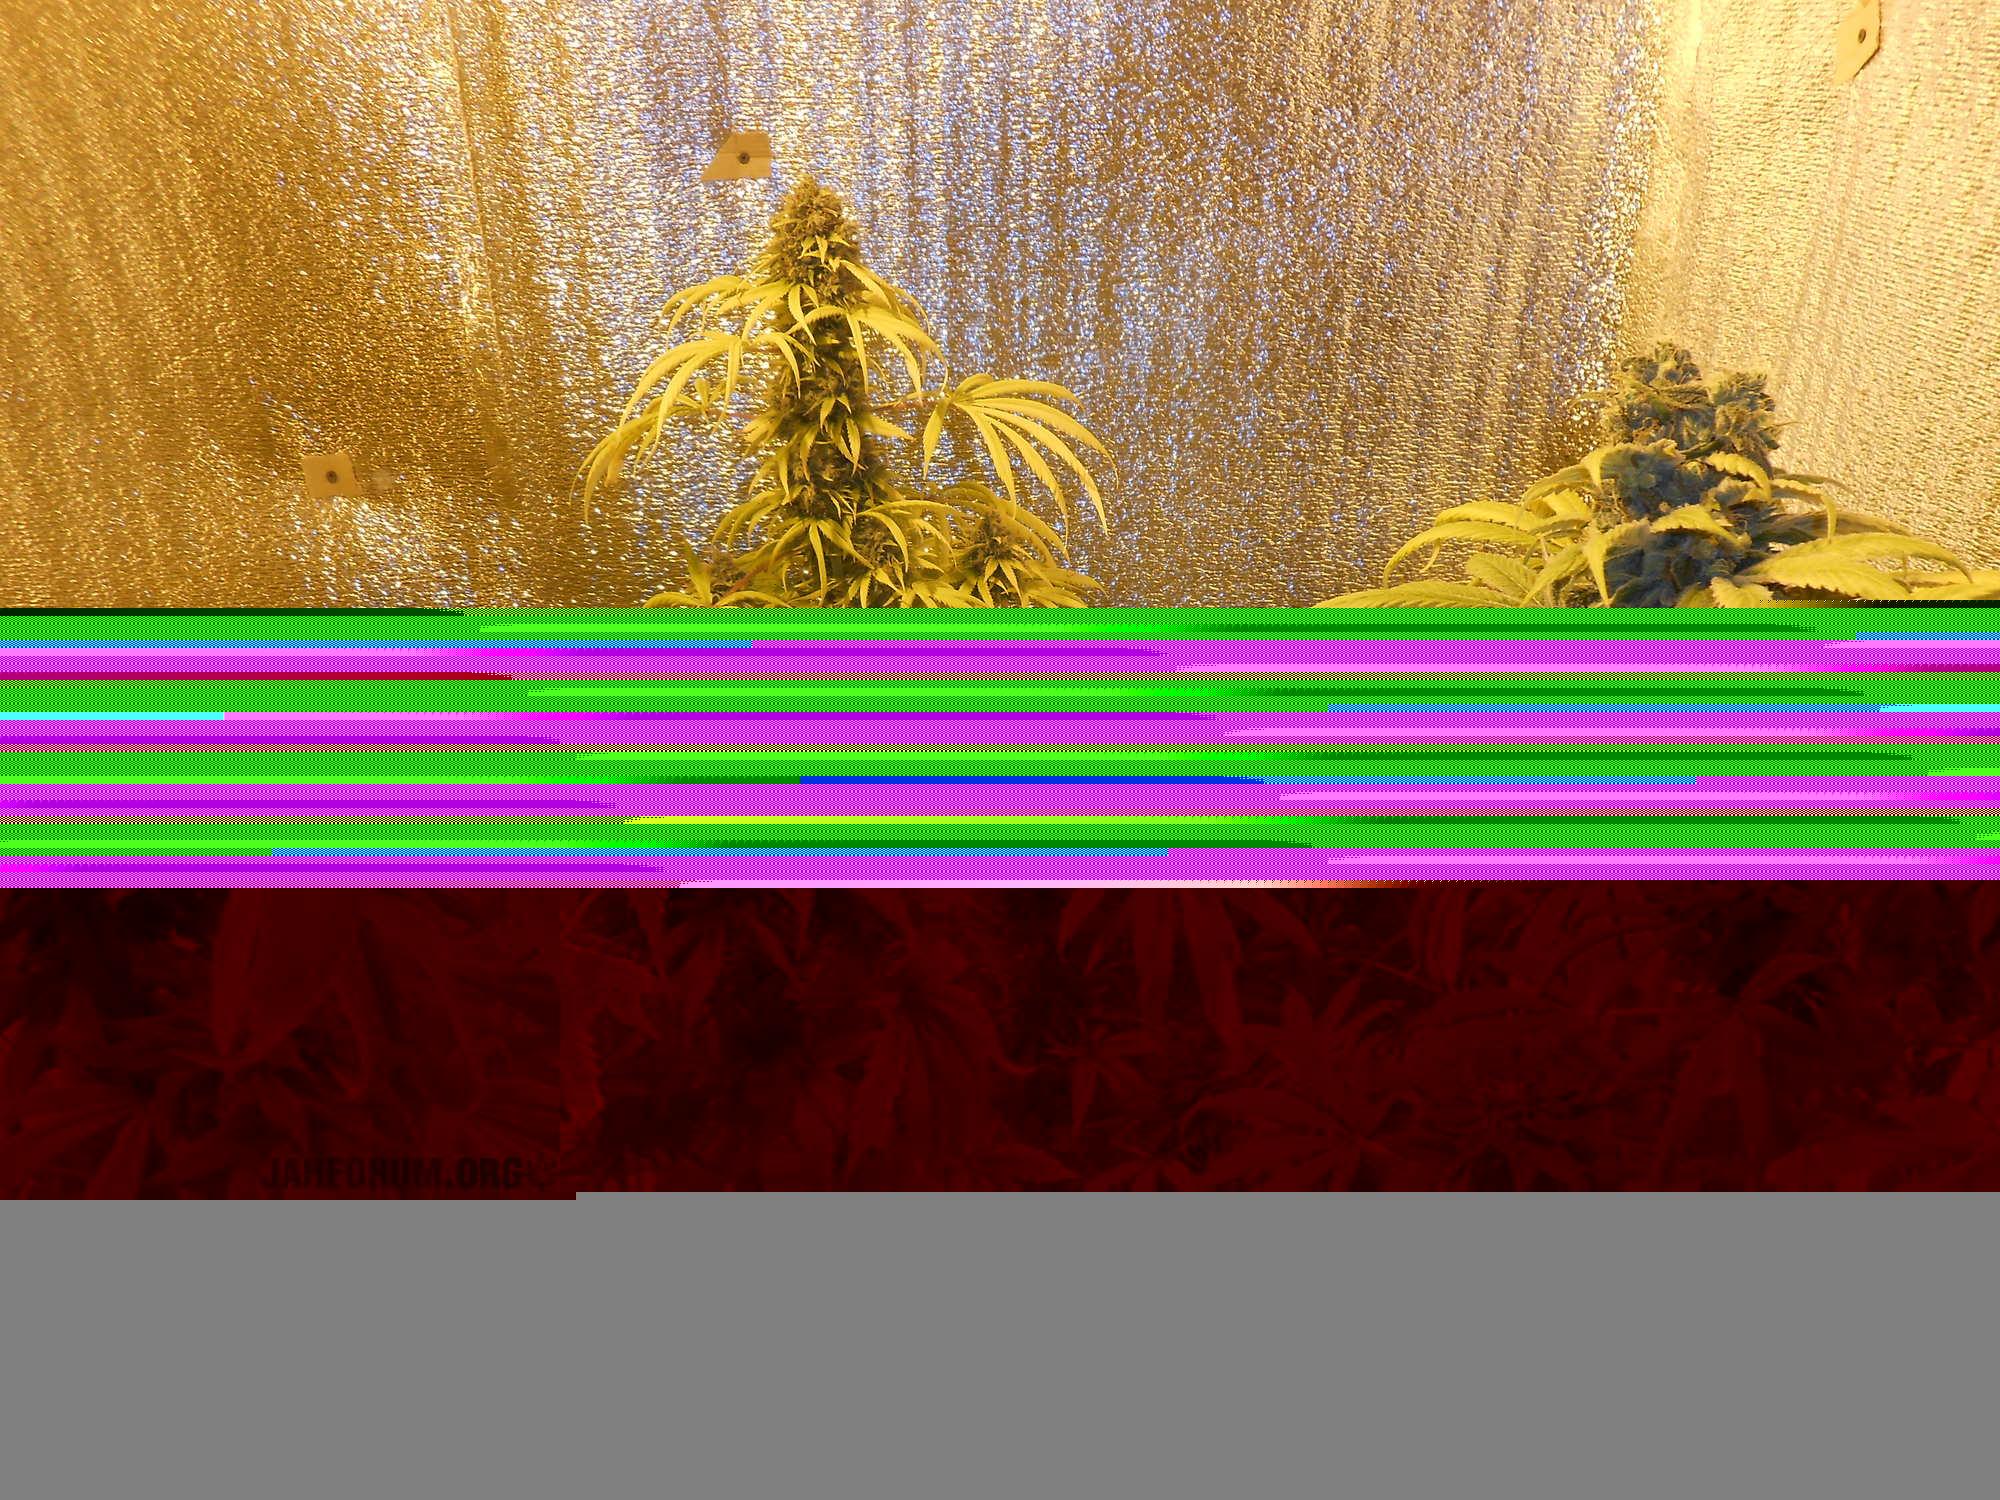 large.DSCN6893.JPG.1990a3a19151f8e10a61b8c52c00285a.JPG